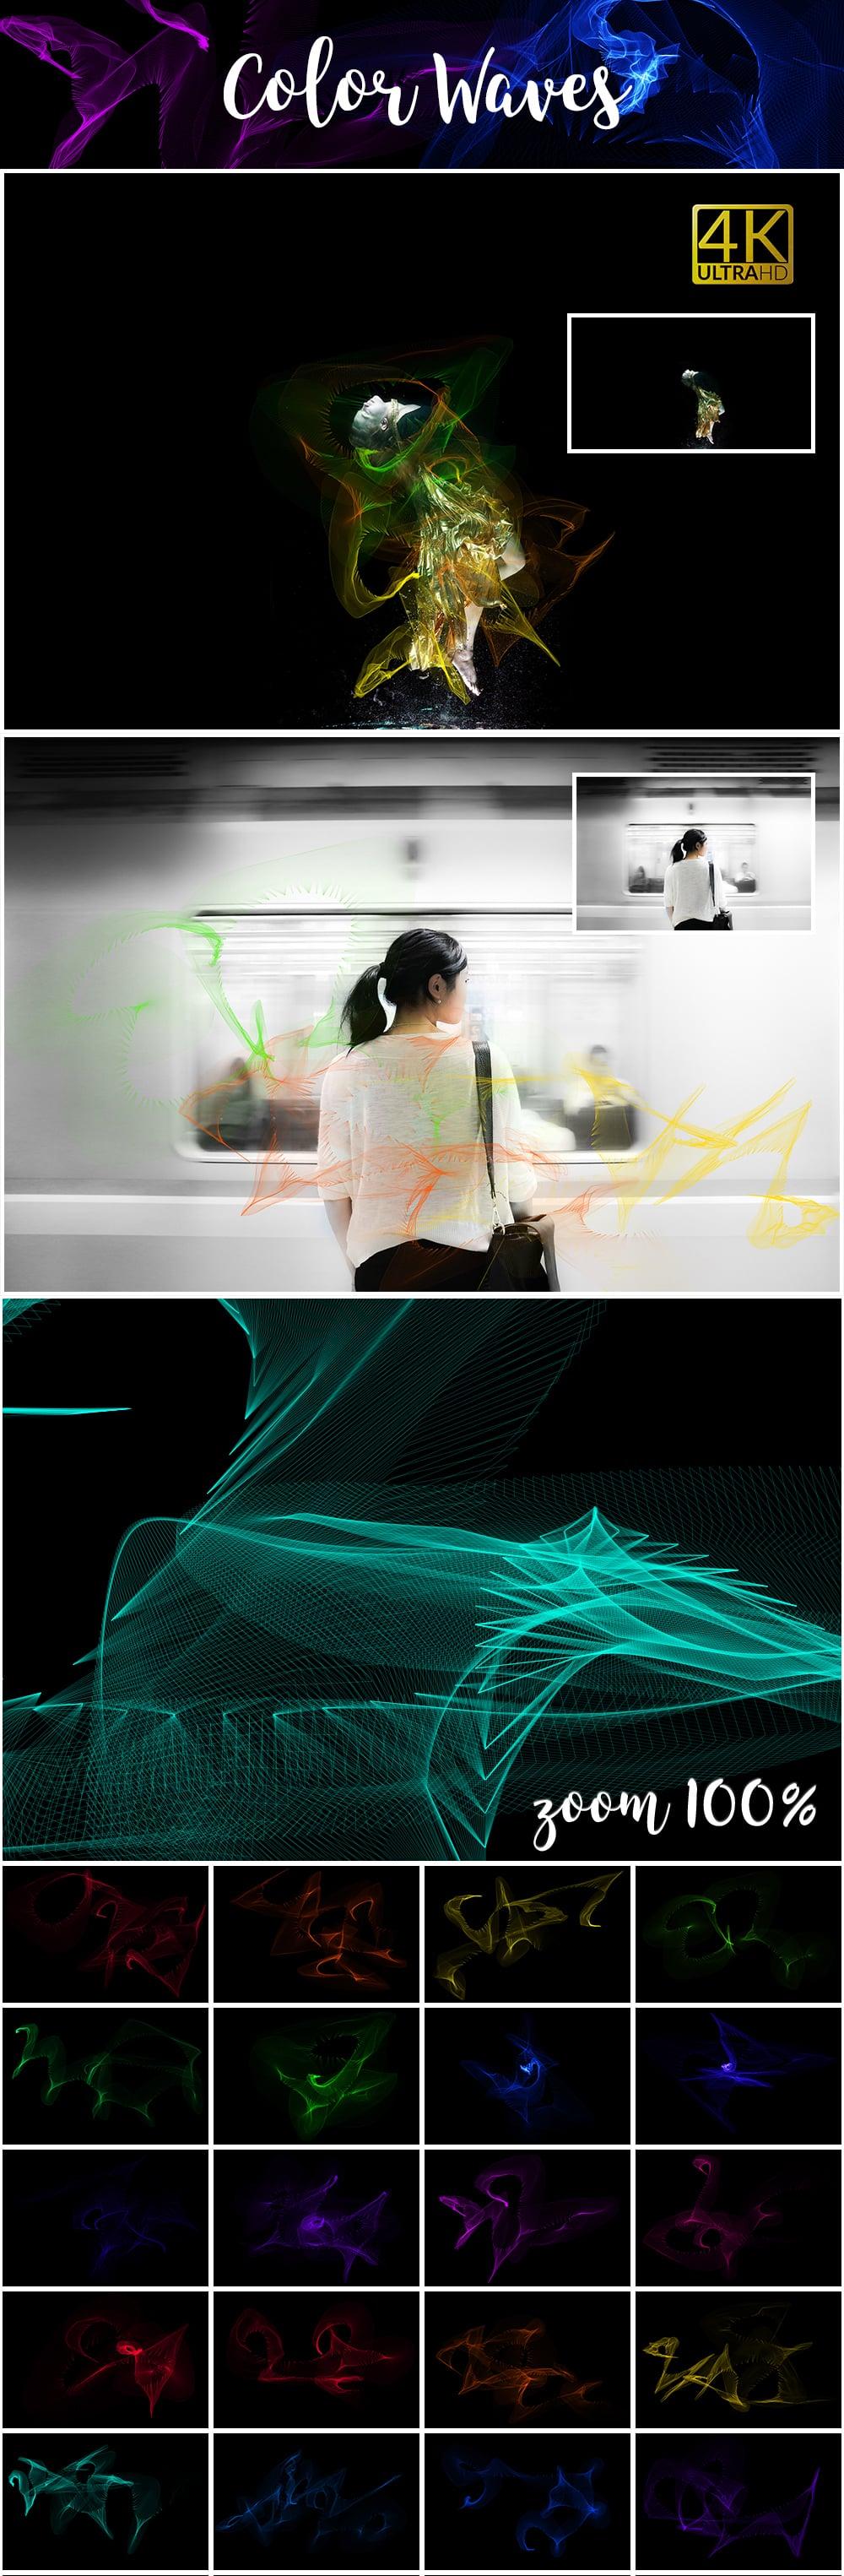 1100 Photoshop Overlays Mega Pack - Extended License - 33 Color Waves